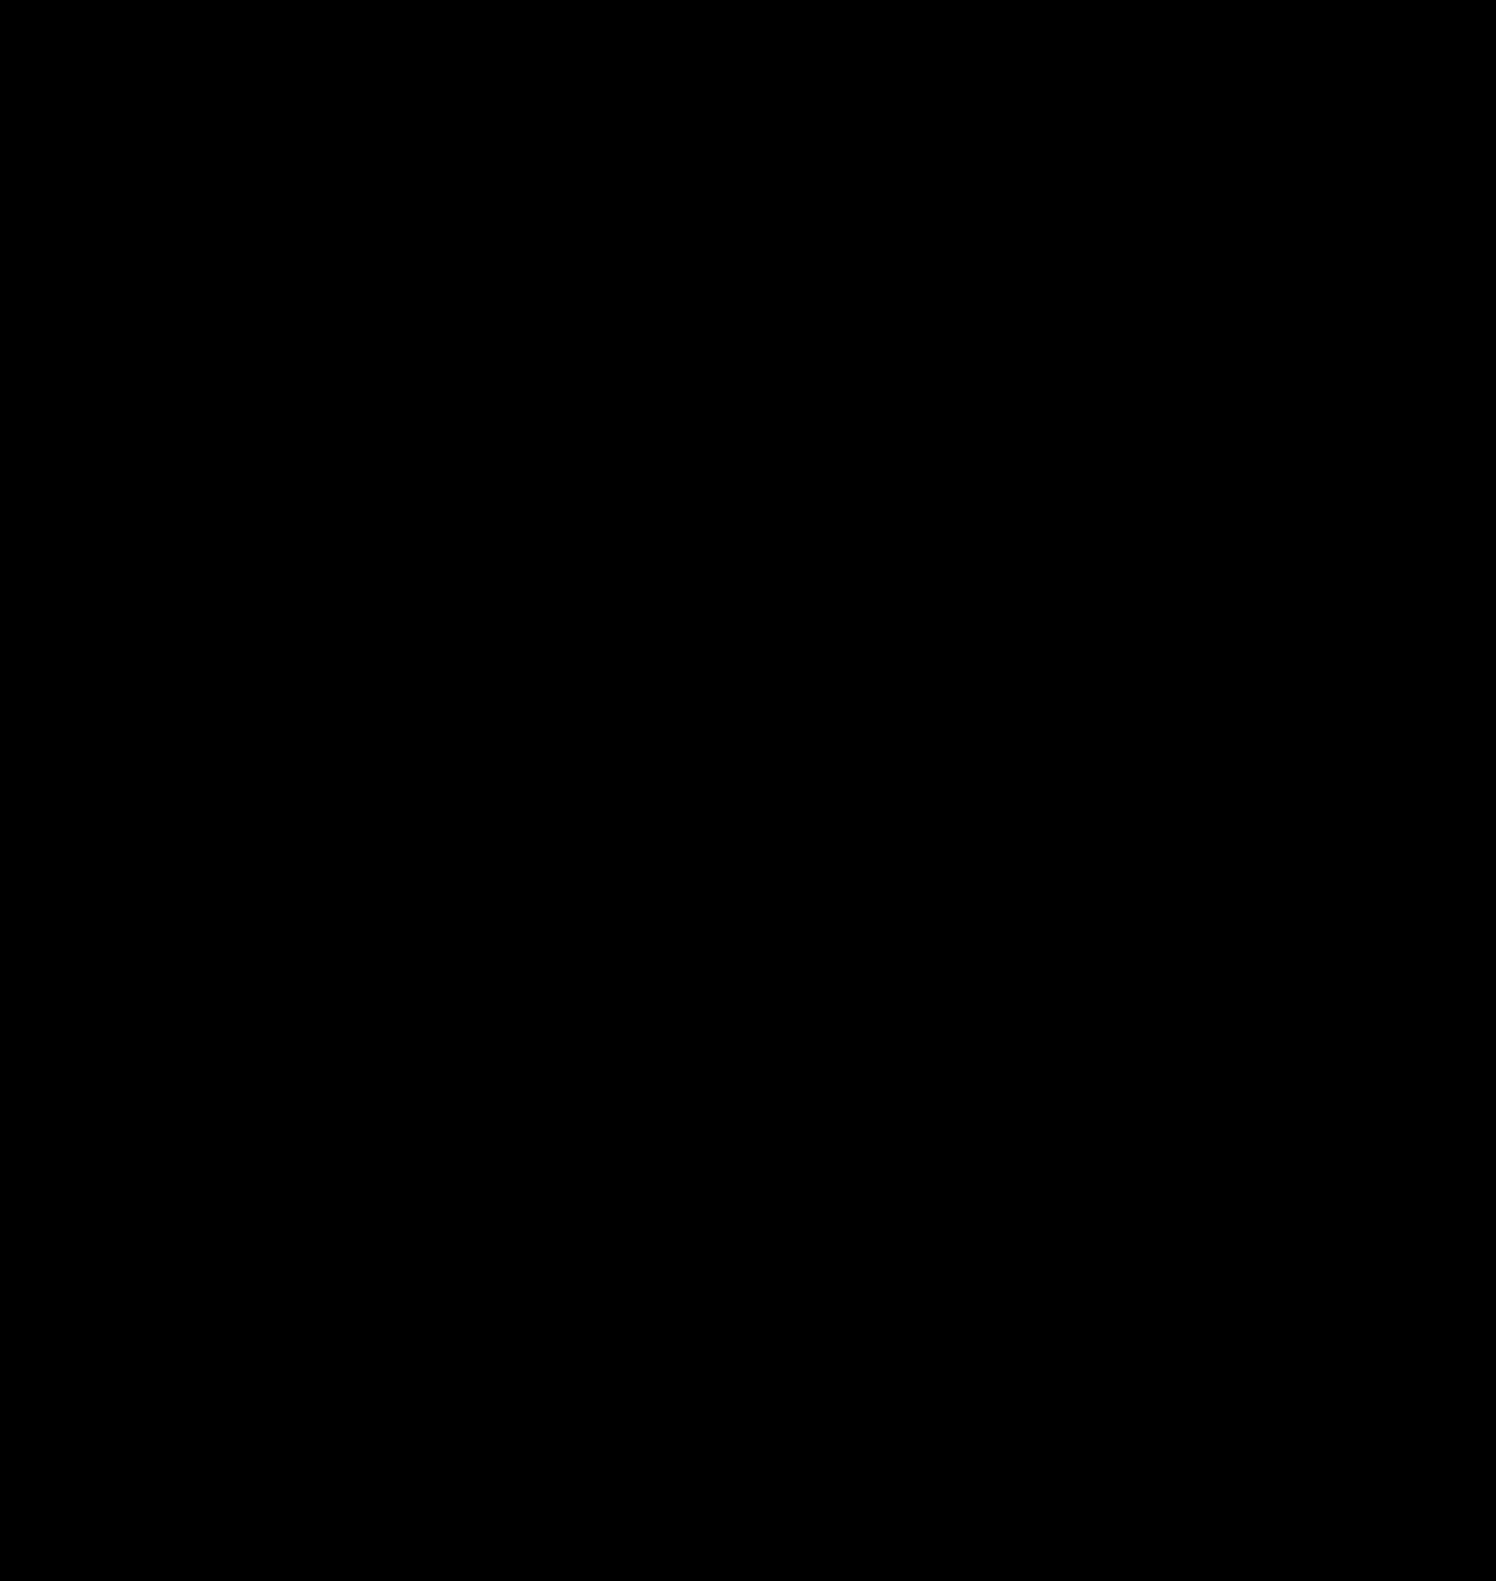 Five Elements And Pentagram - Elements Of Life Symbols (2000x2000), Png Download